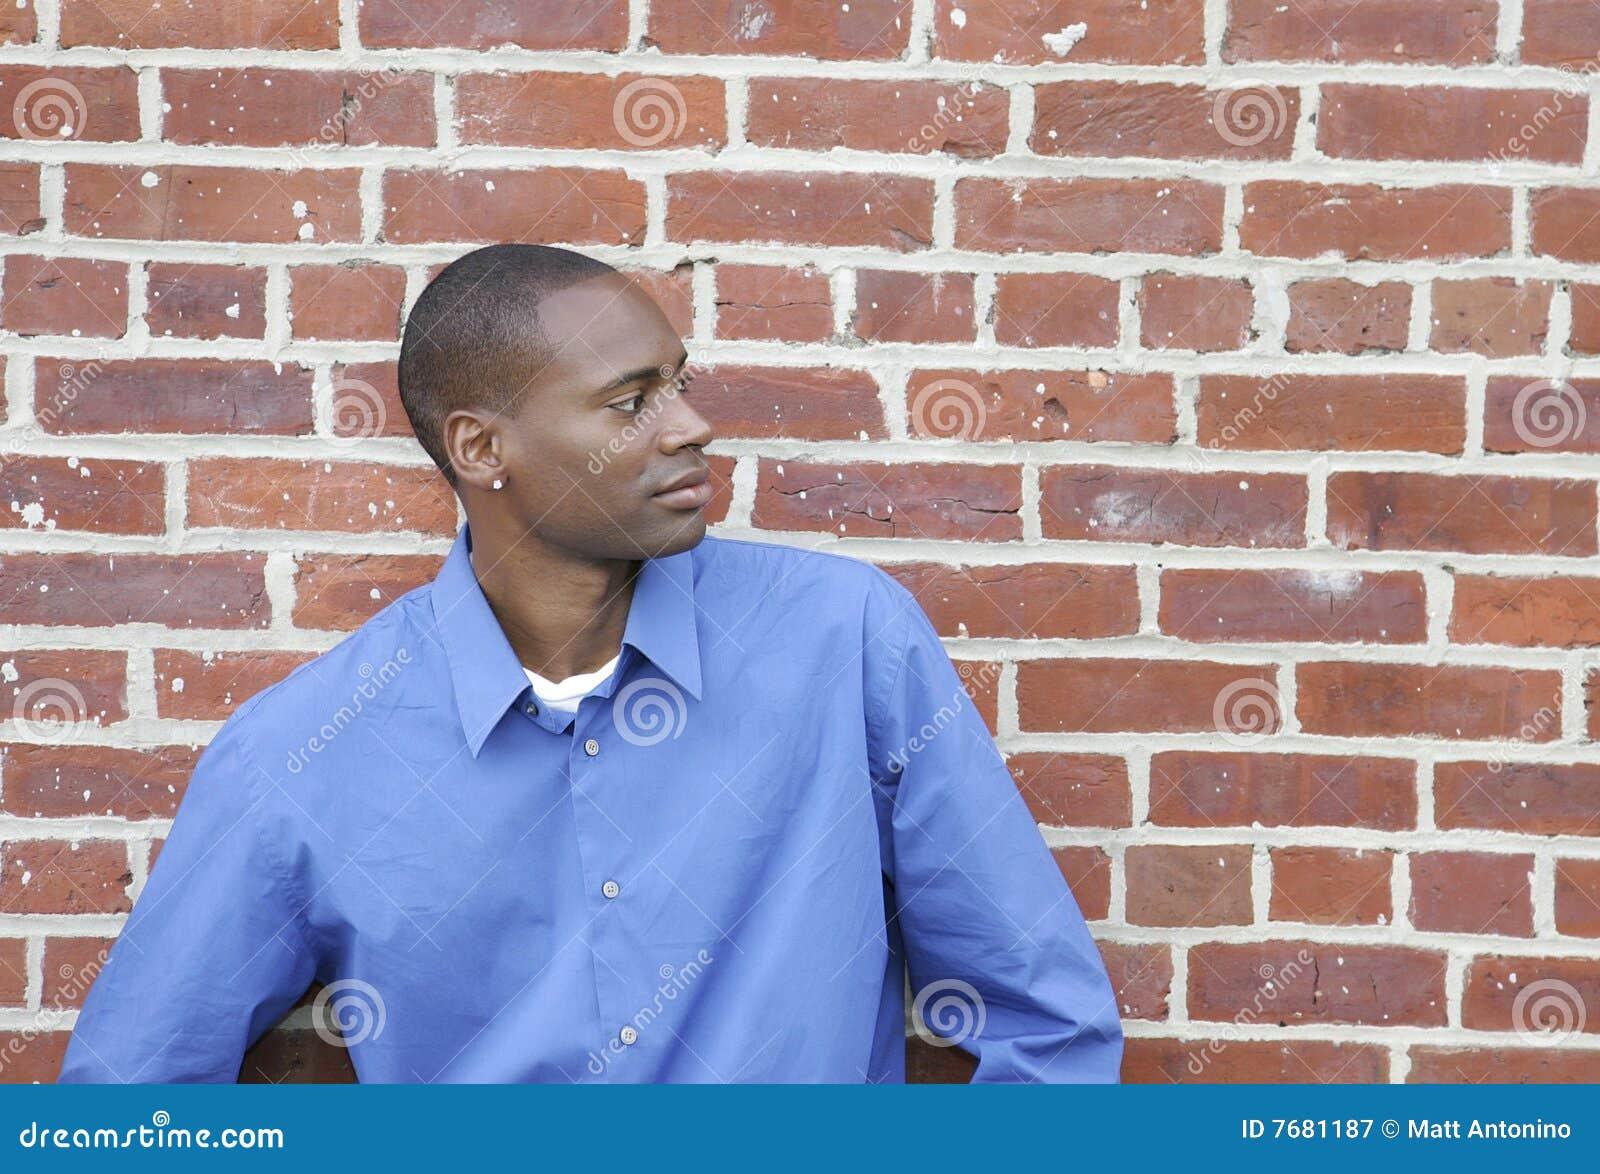 brick single men Find women seeking men listings looking for casual encounters on oodle women seeking men looking for casual encounters (1 - 6 single woman with a.